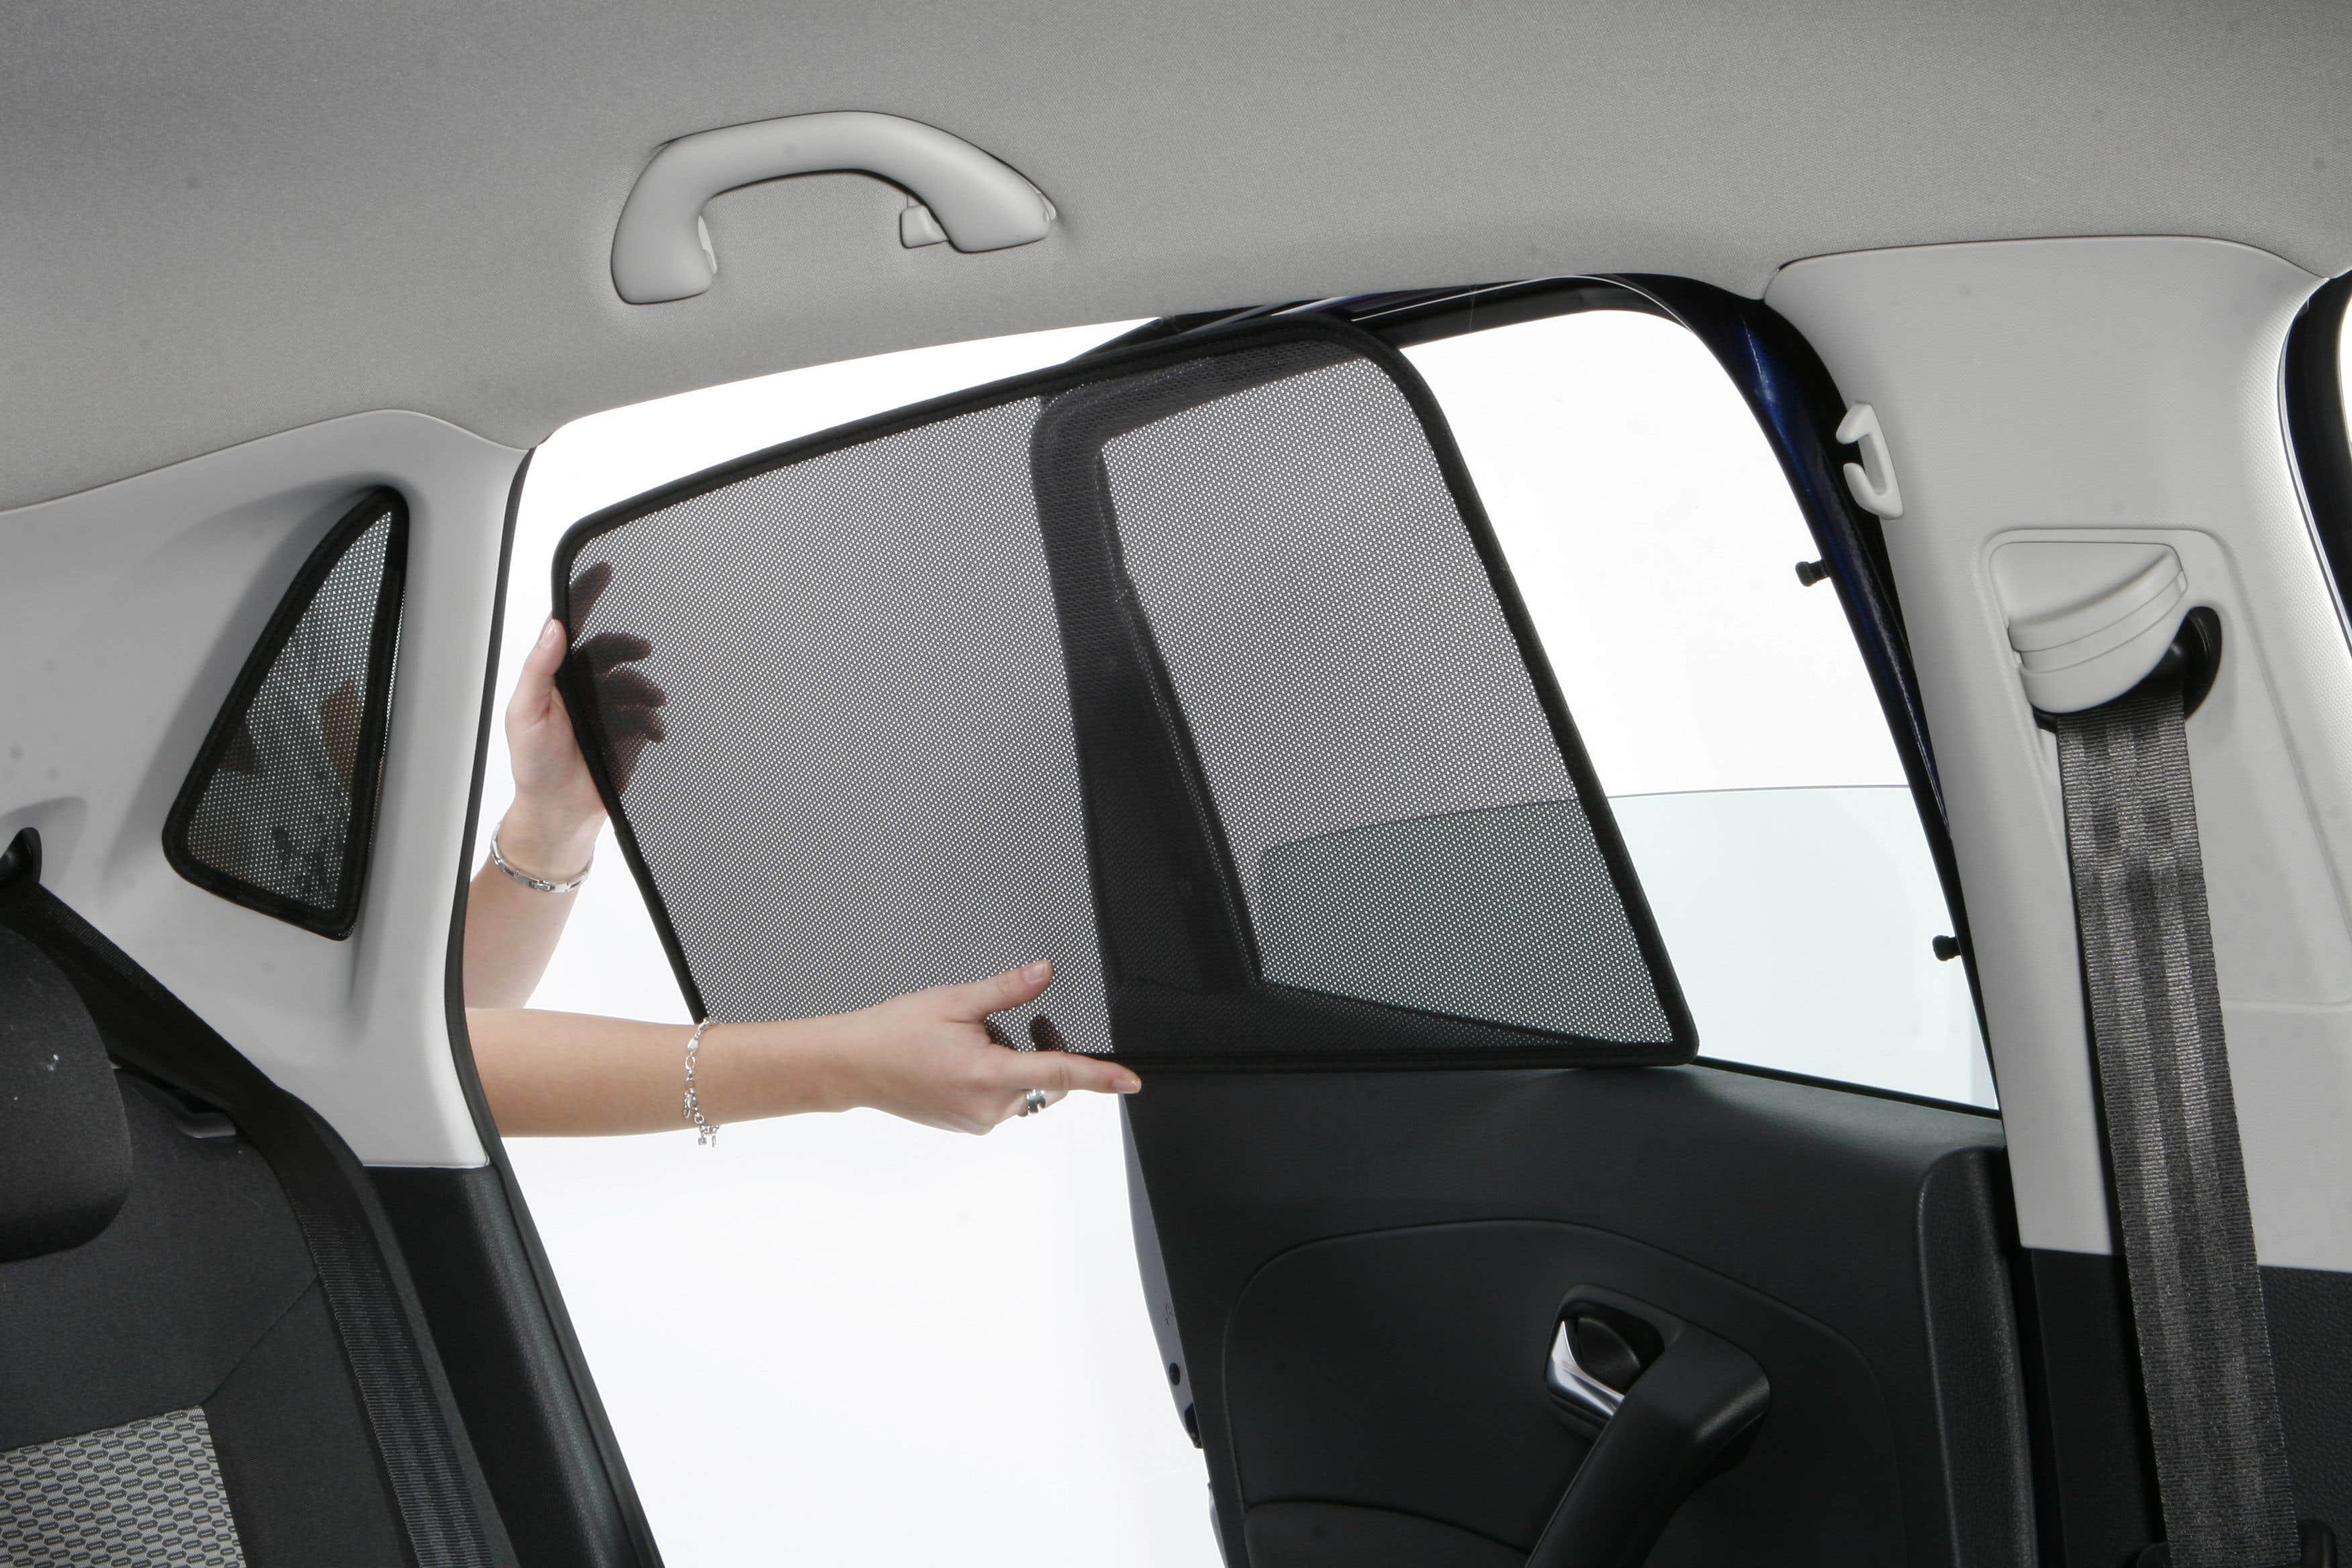 Windows of Car Closed